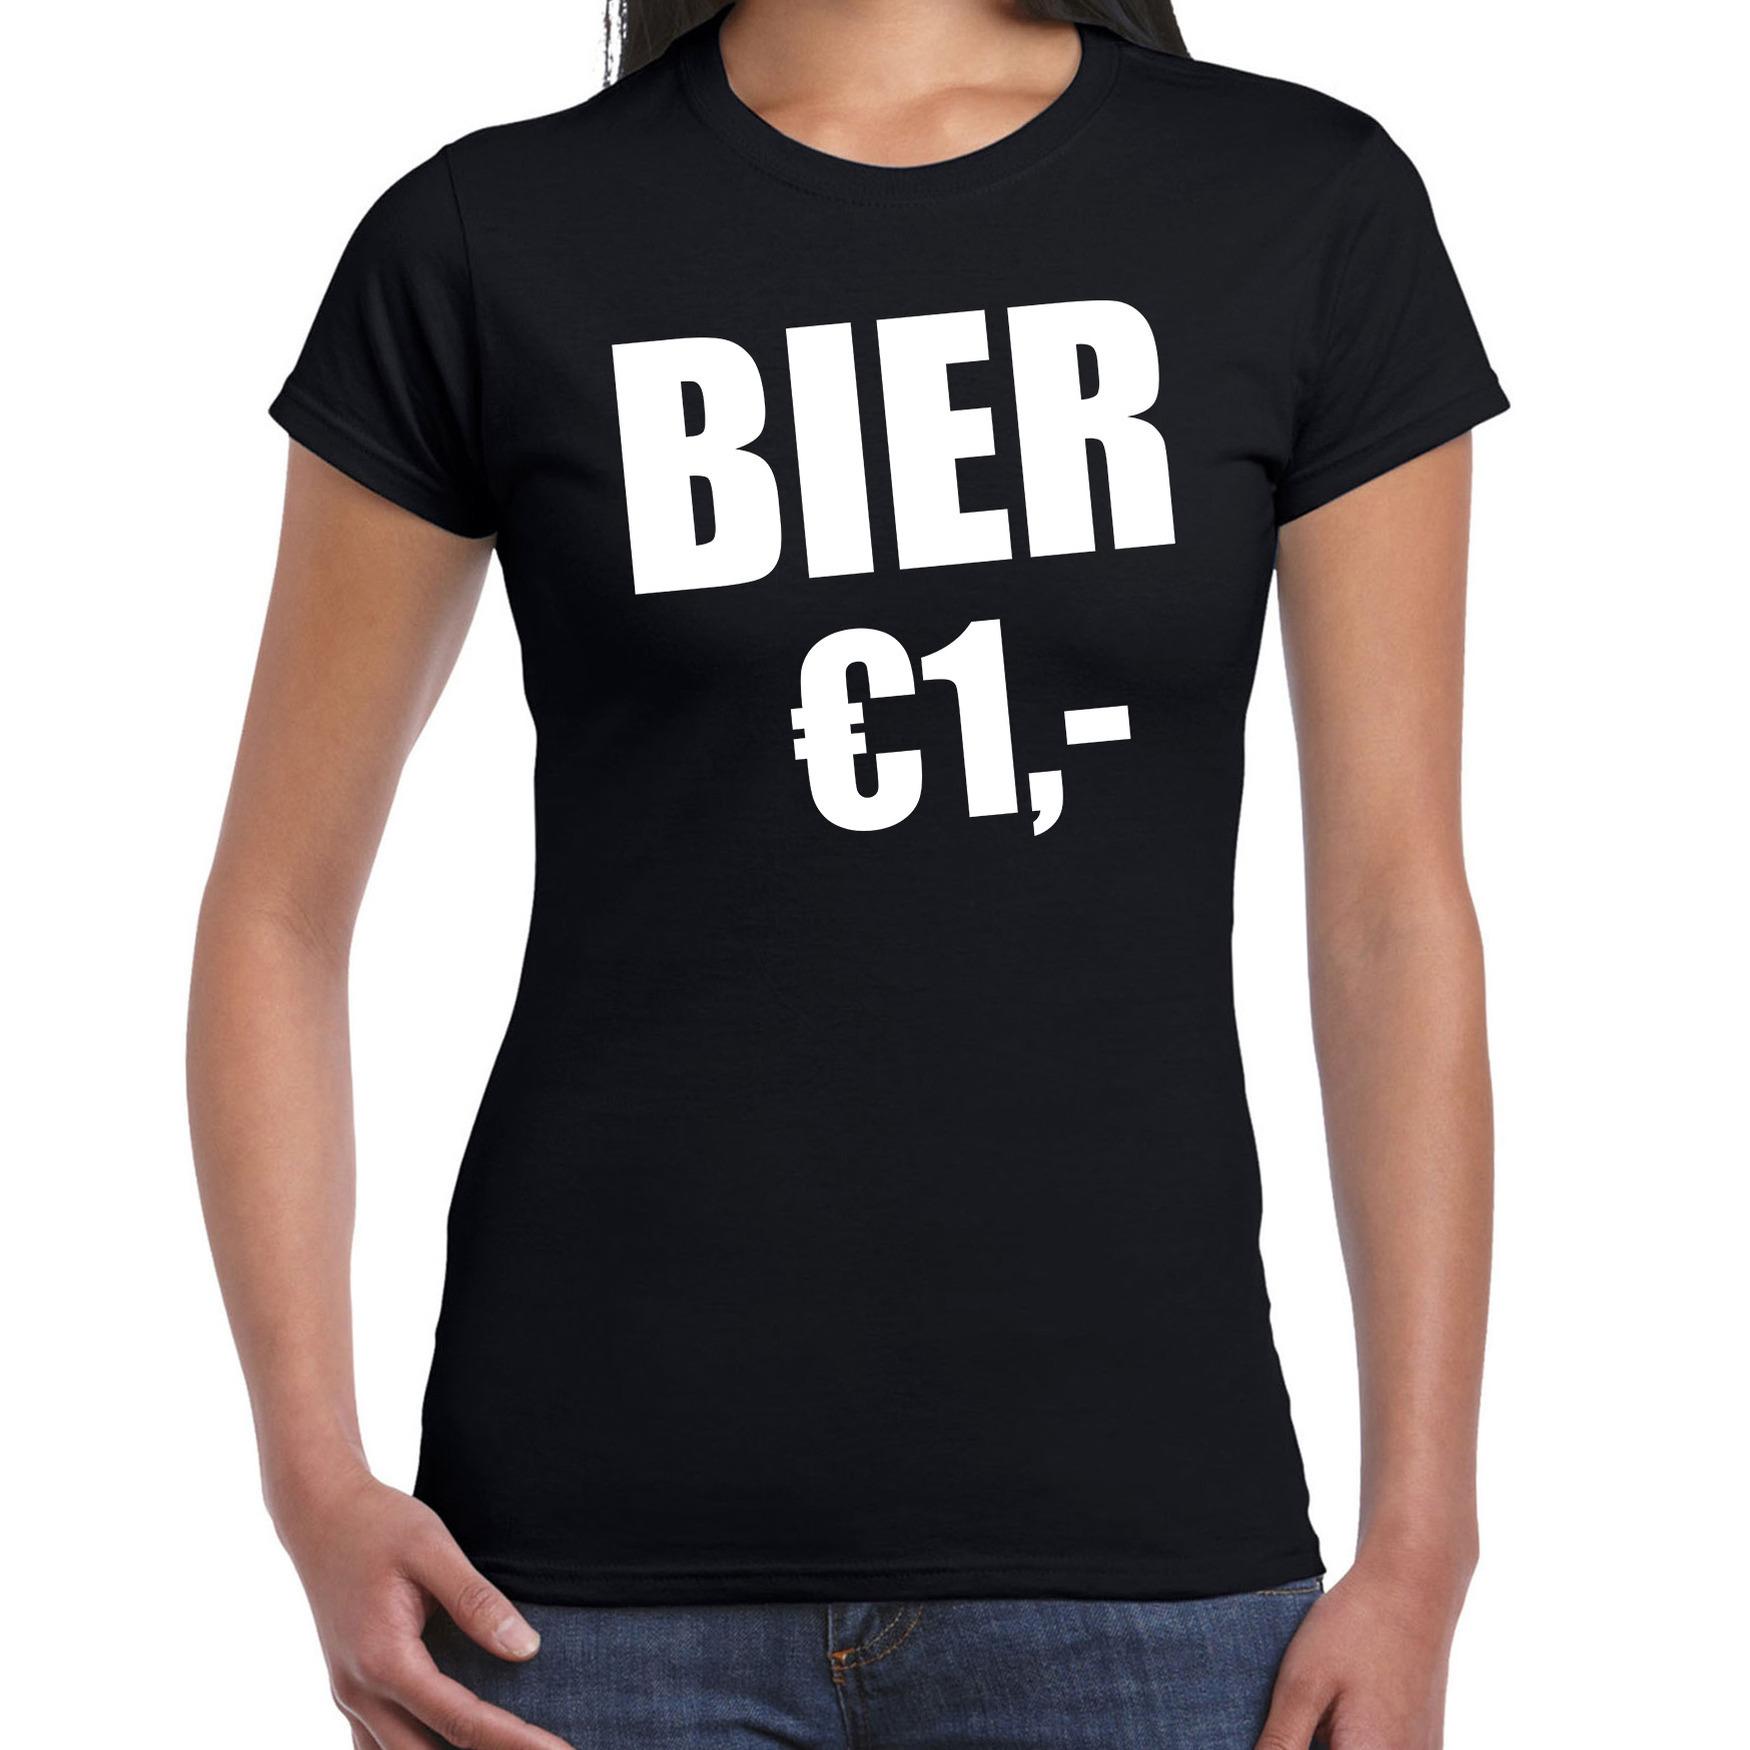 Fun t-shirt bier 1 euro zwart voor dames XL -